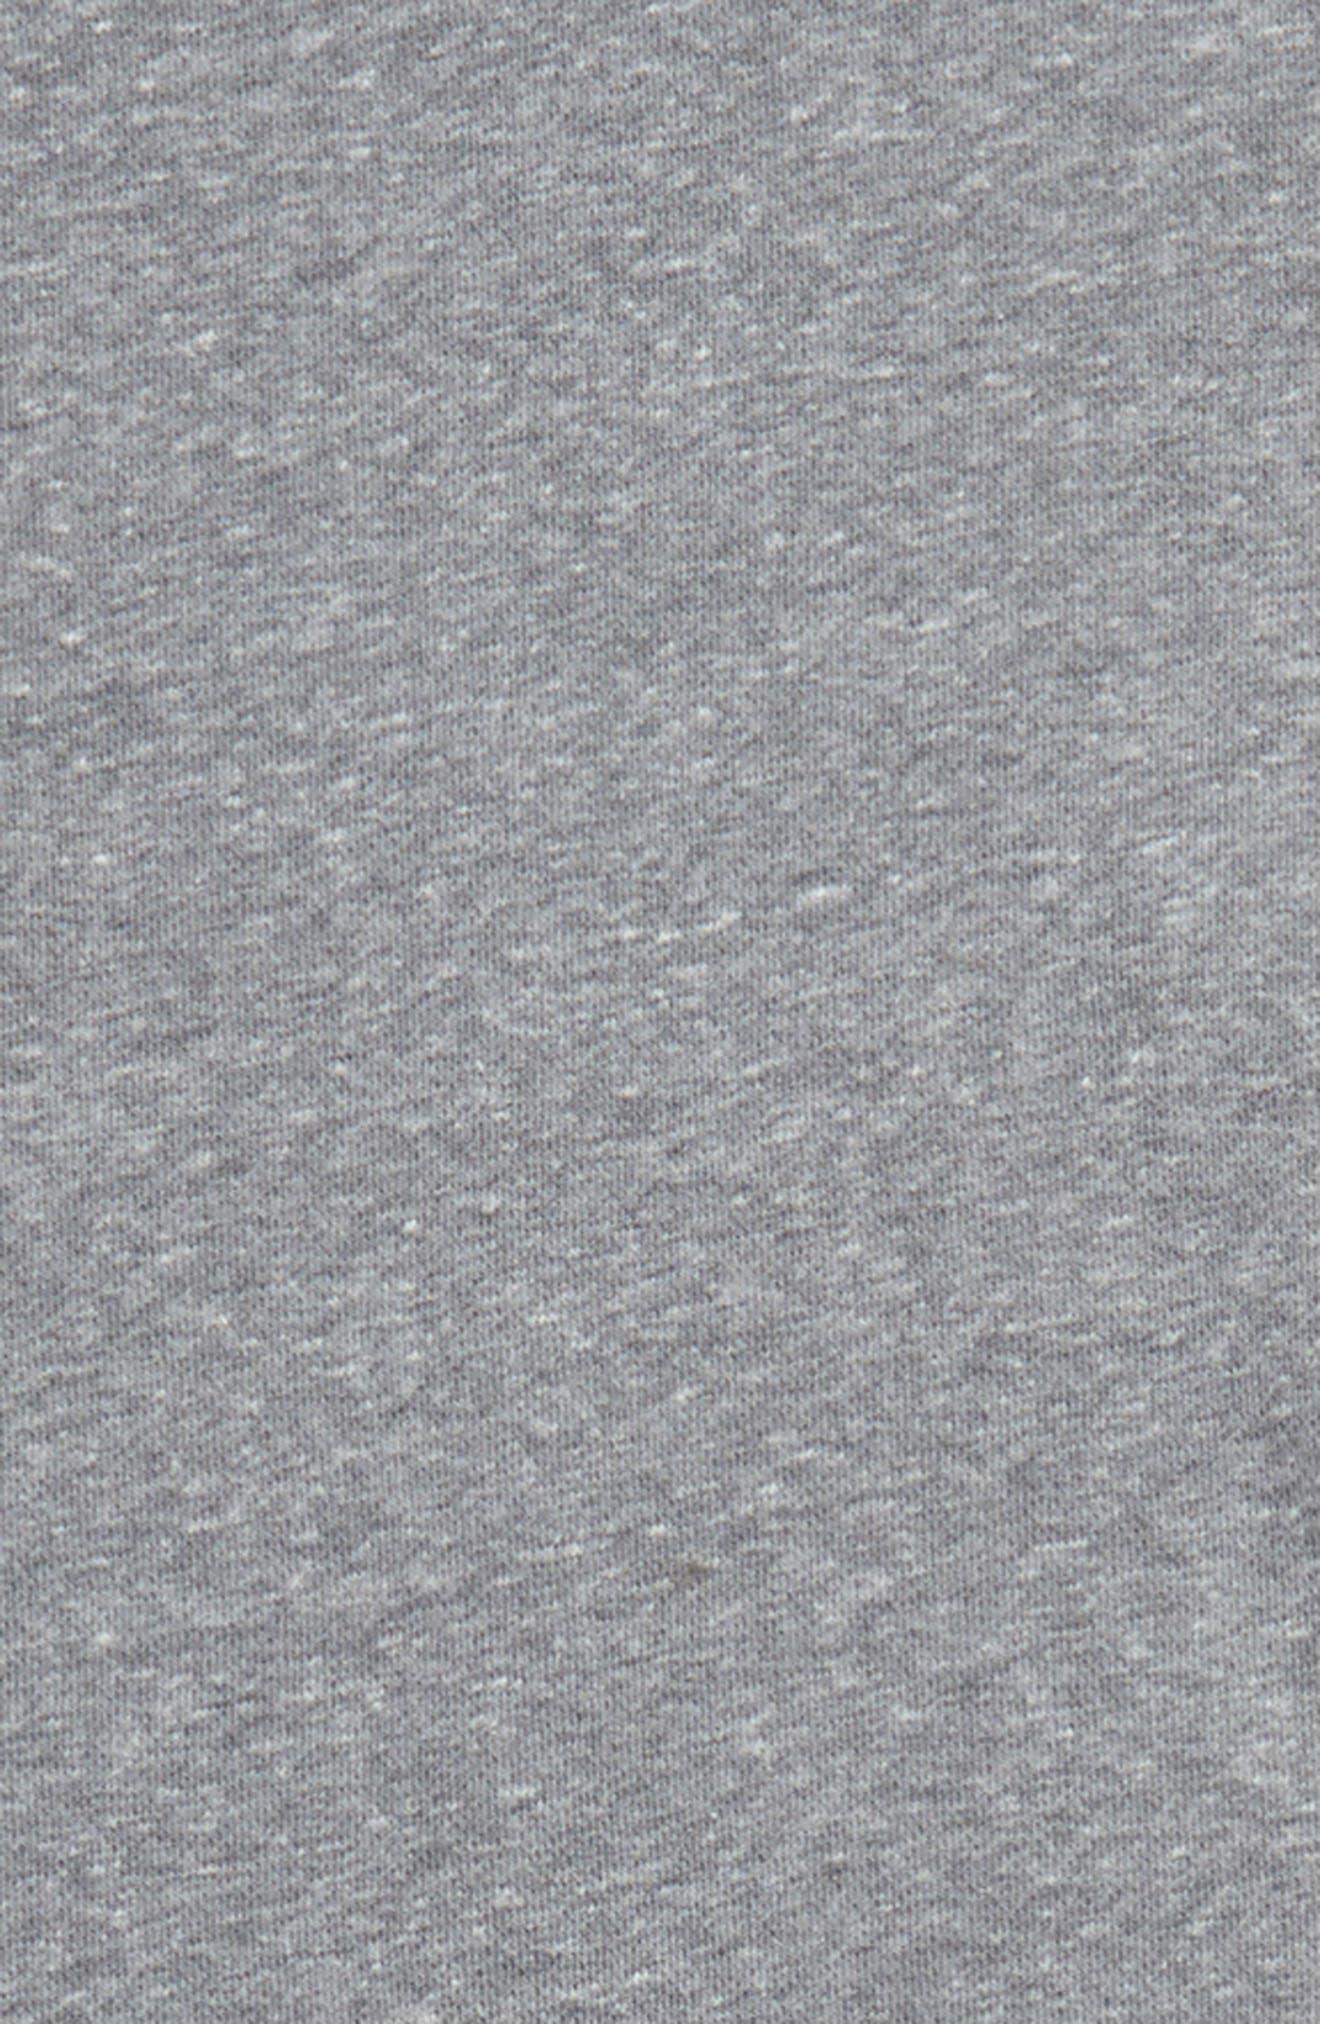 Hooded Short Sleeve Sweatshirt,                             Alternate thumbnail 2, color,                             030